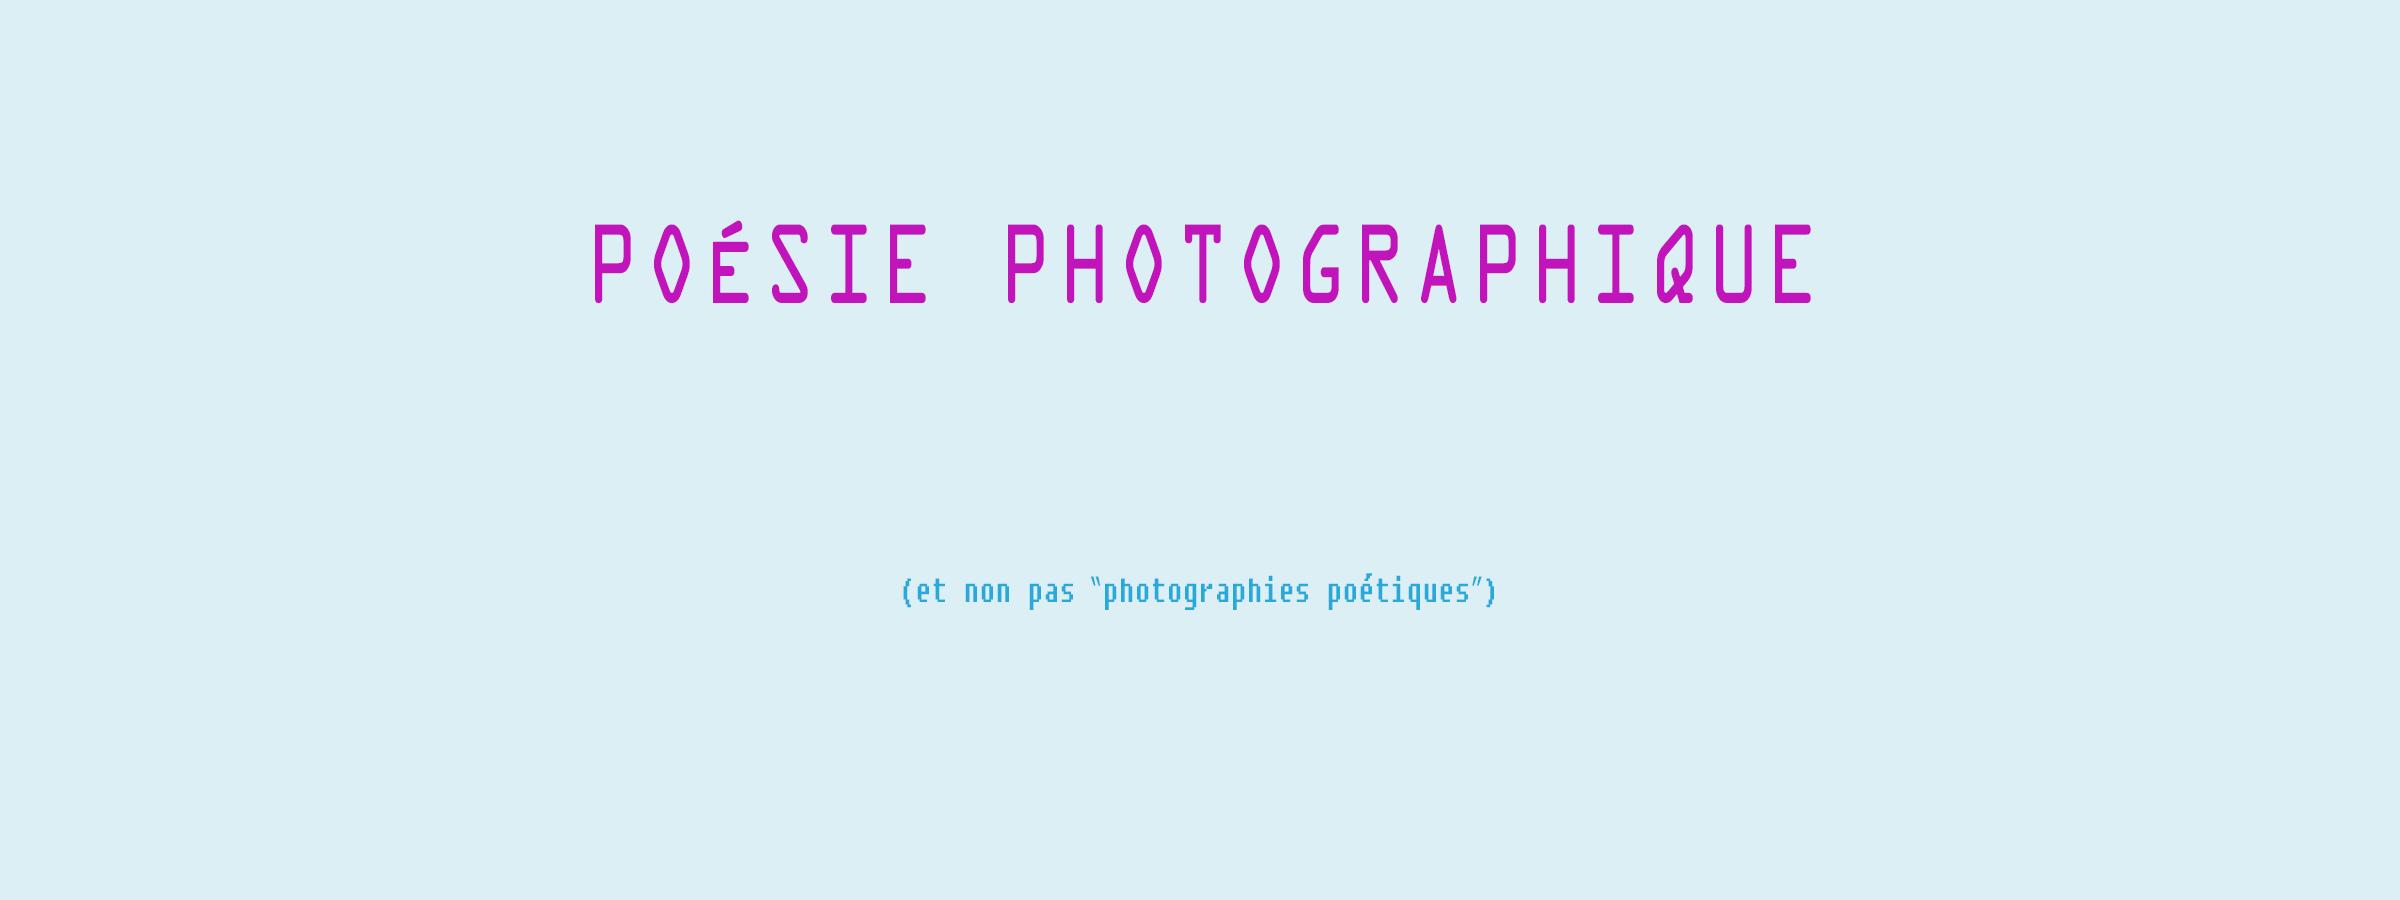 Poésie-photographique